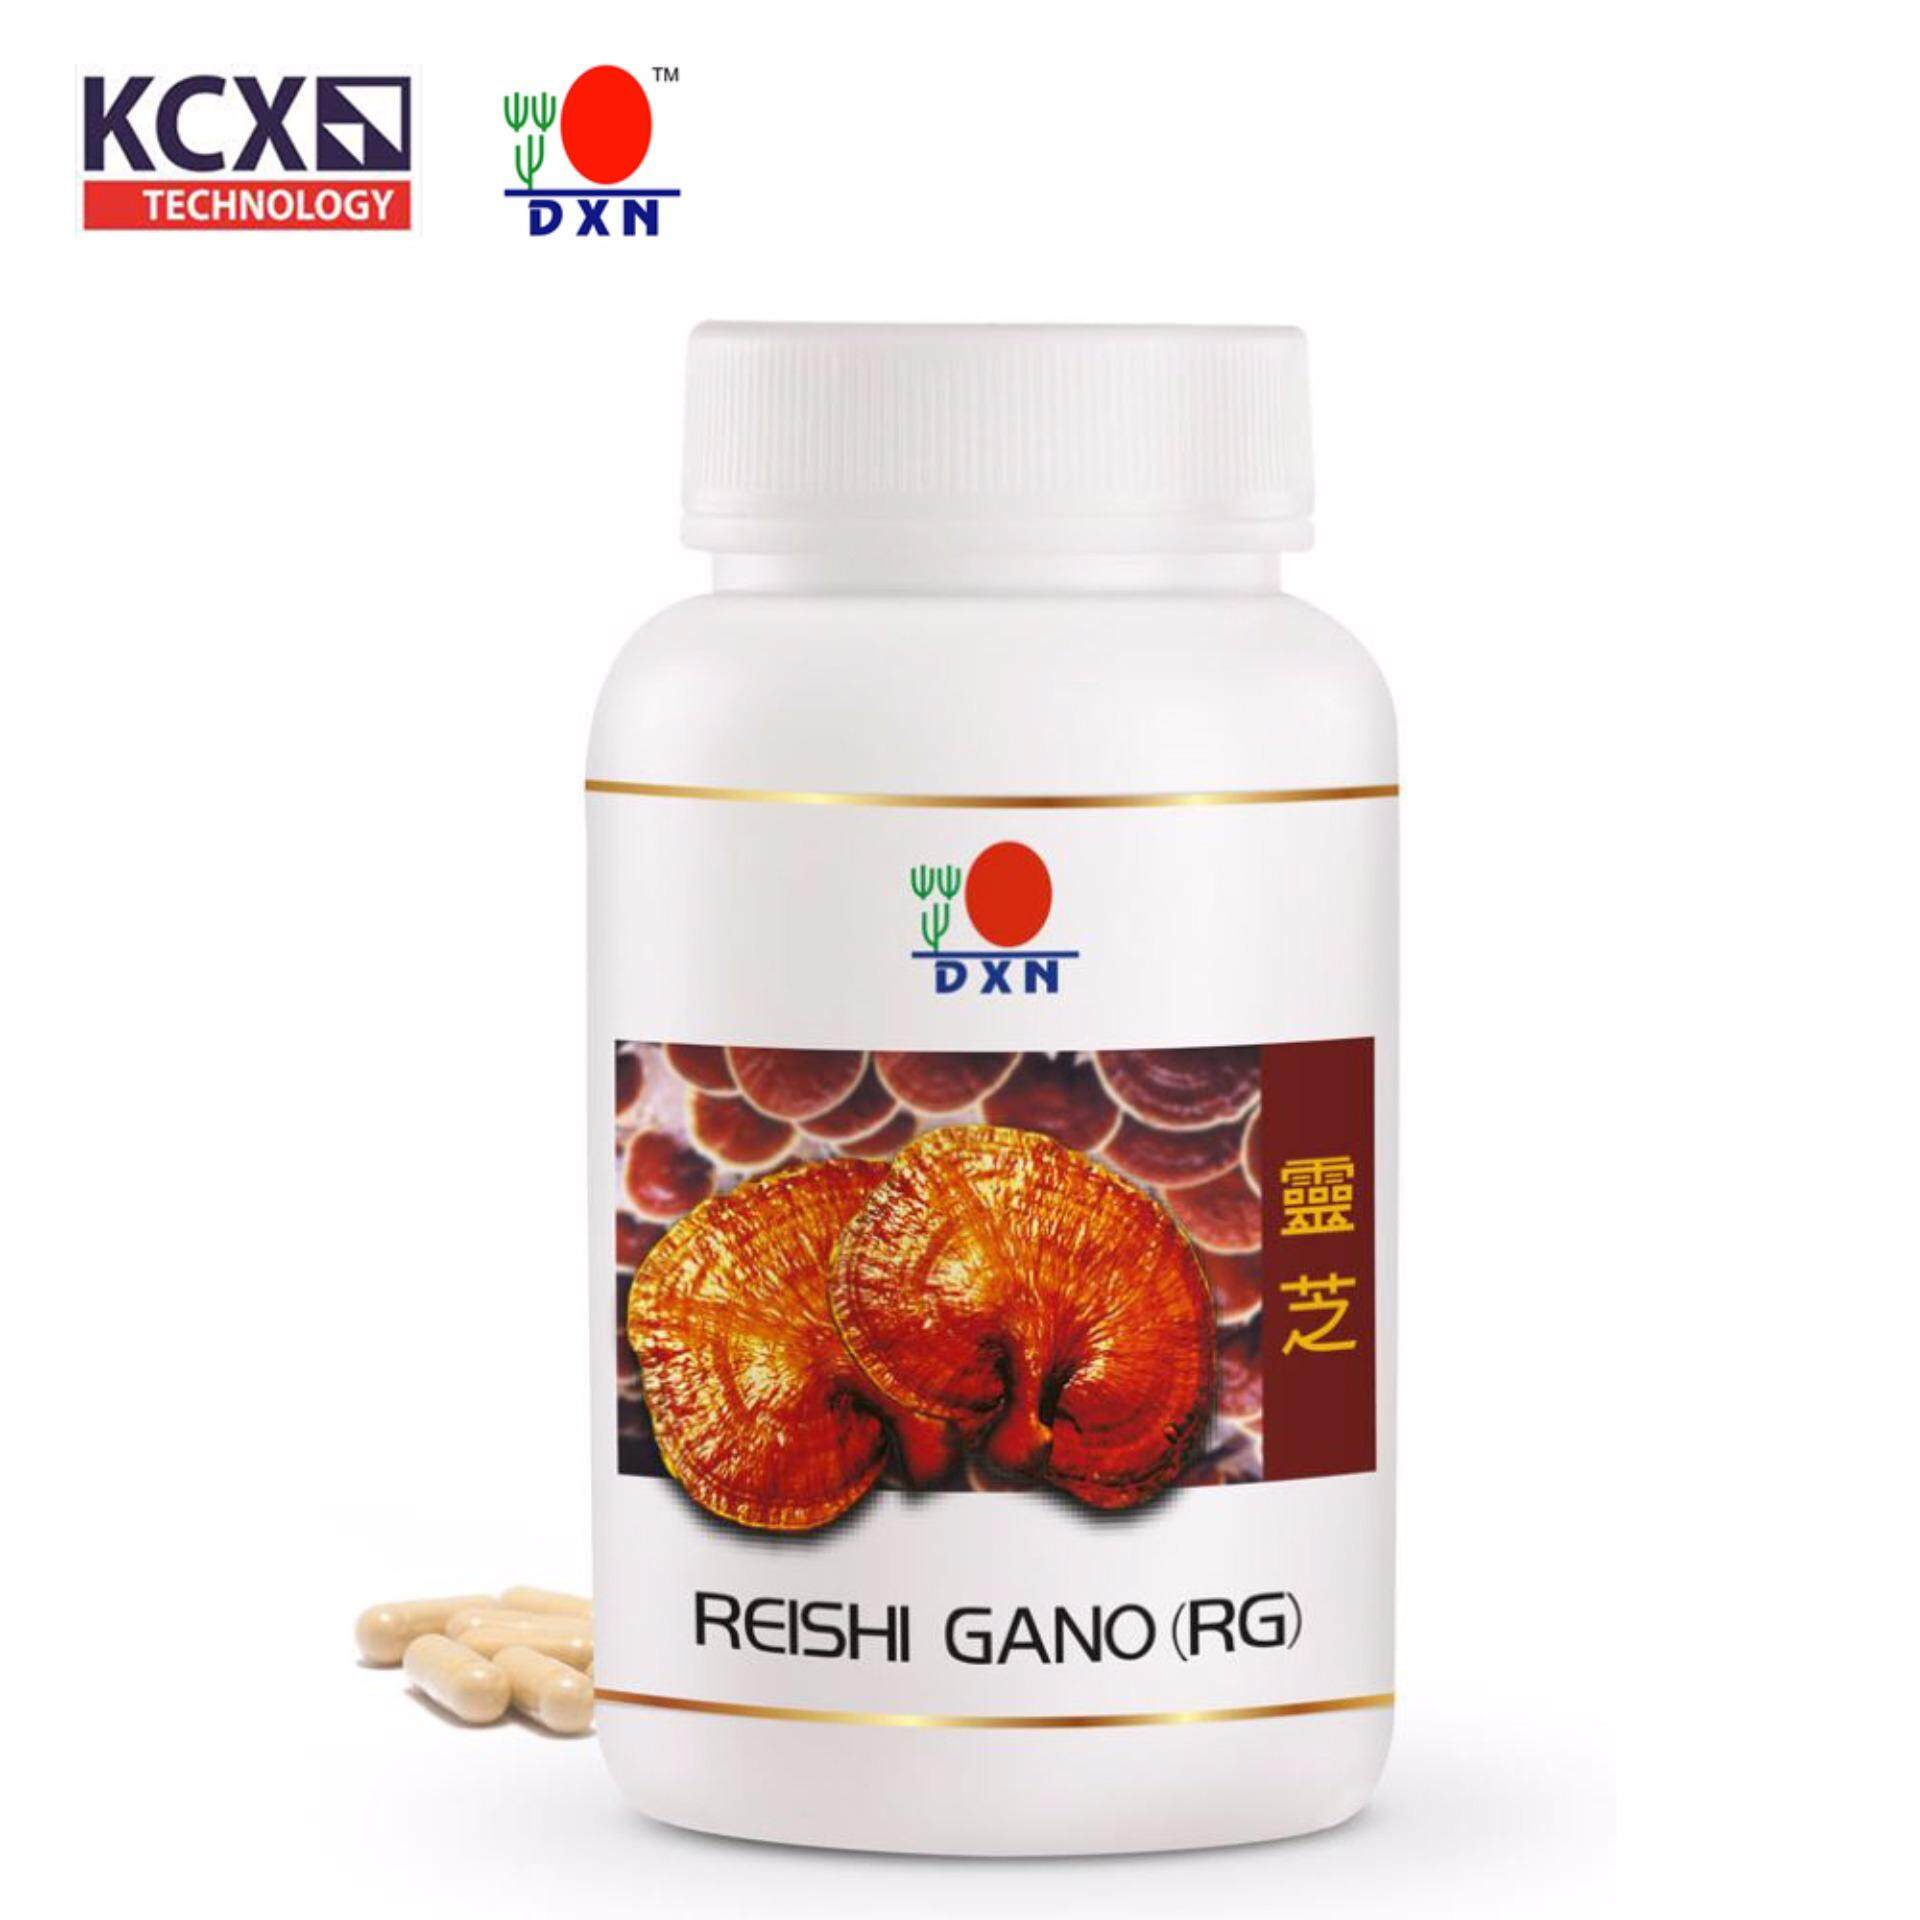 DXN Lingzhi Reishi Gano (RG) - 90 Capsules